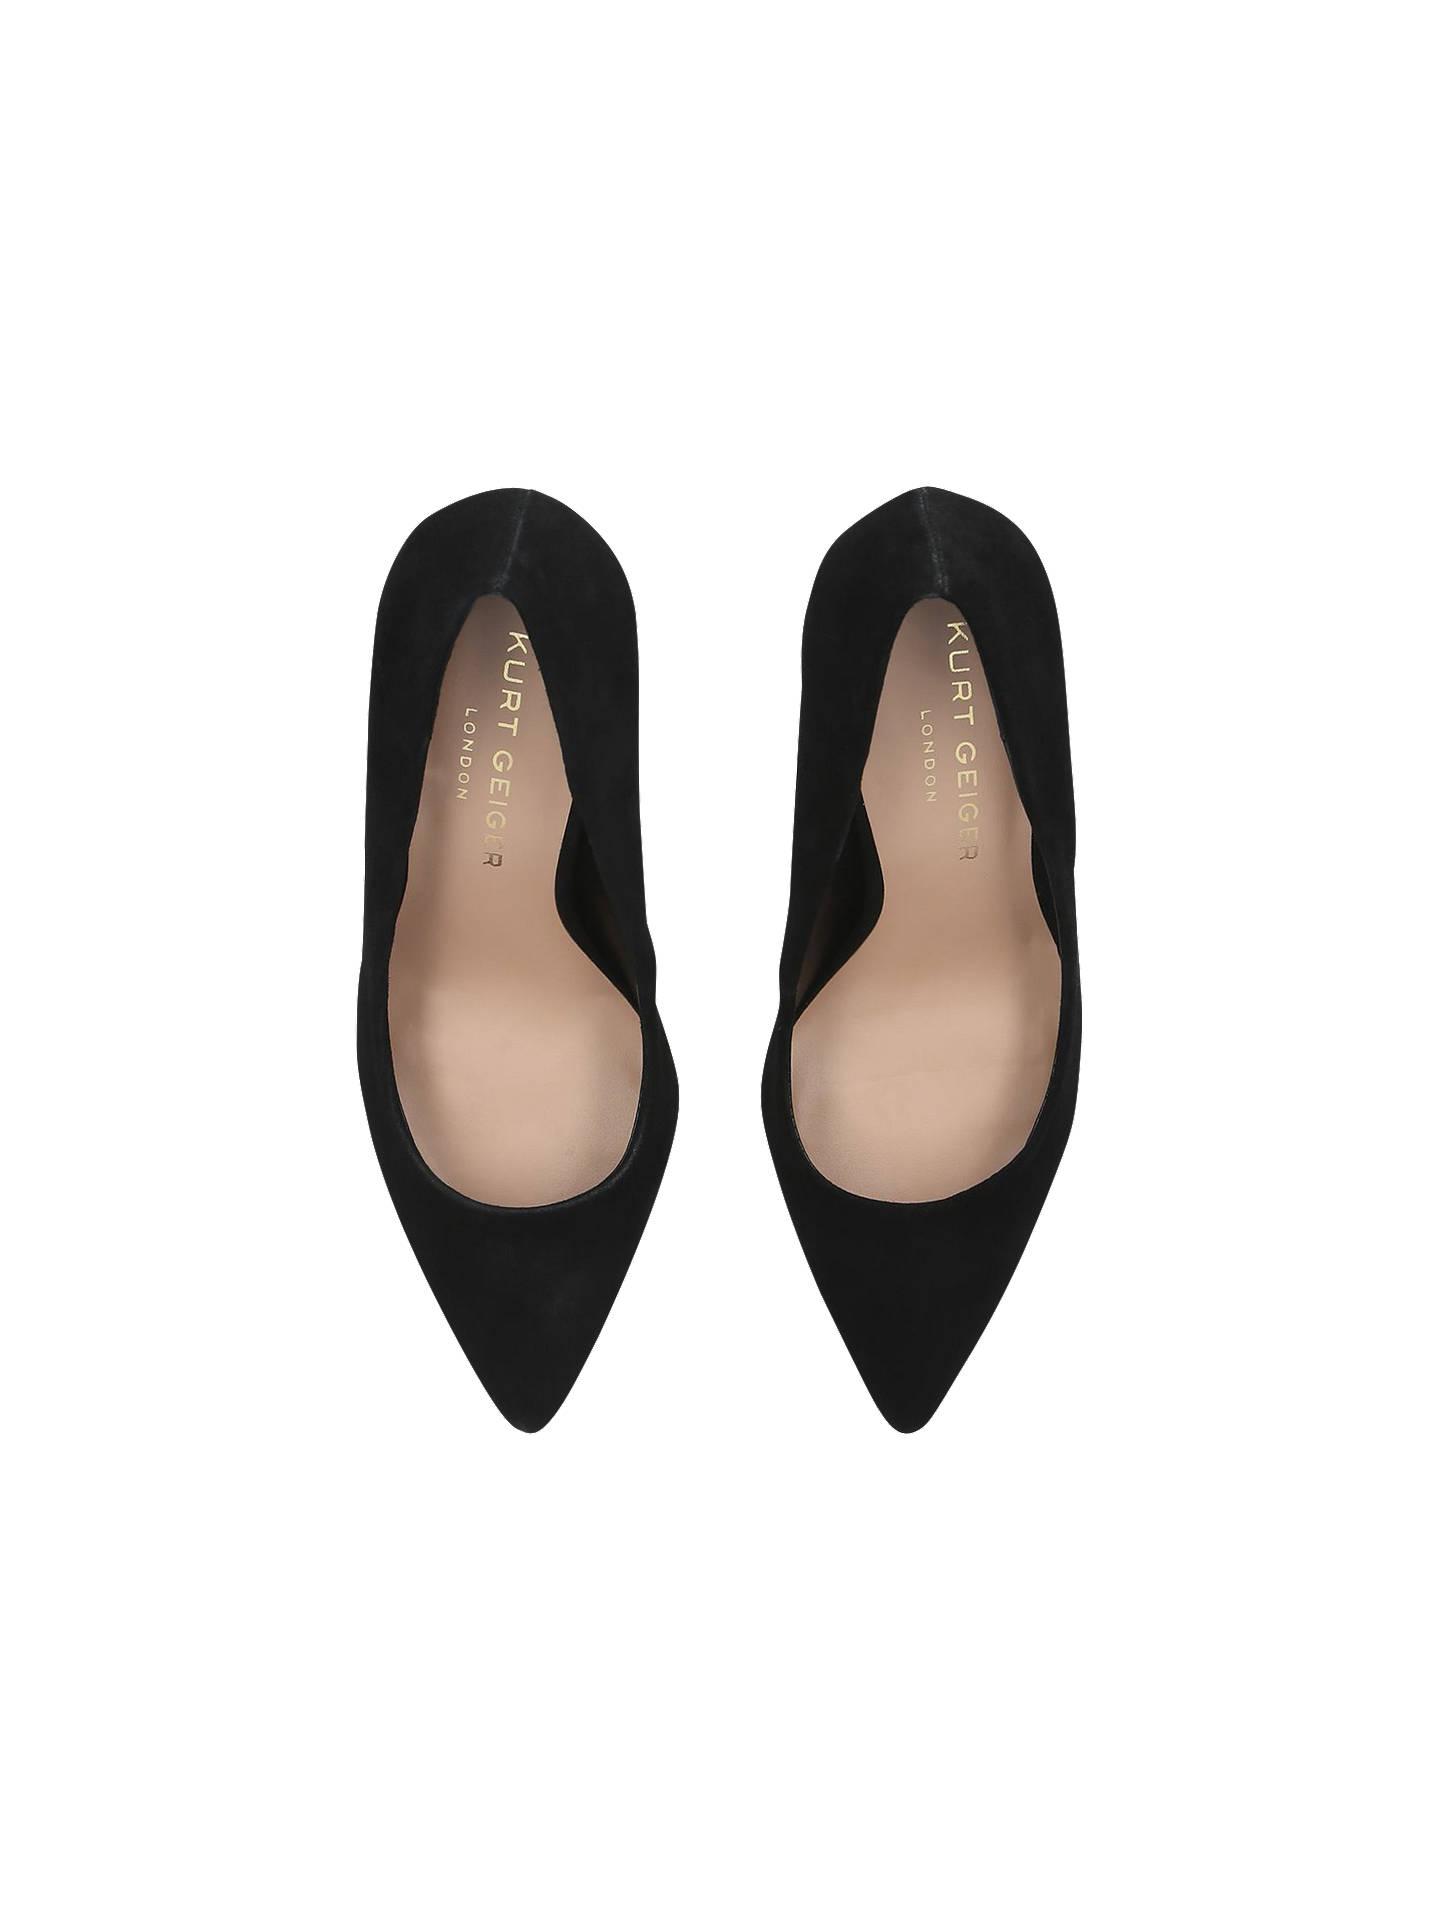 84b3629e14 ... Buy Kurt Geiger London Audley High Heel Court Shoes, Black Suede, 3  Online at ...